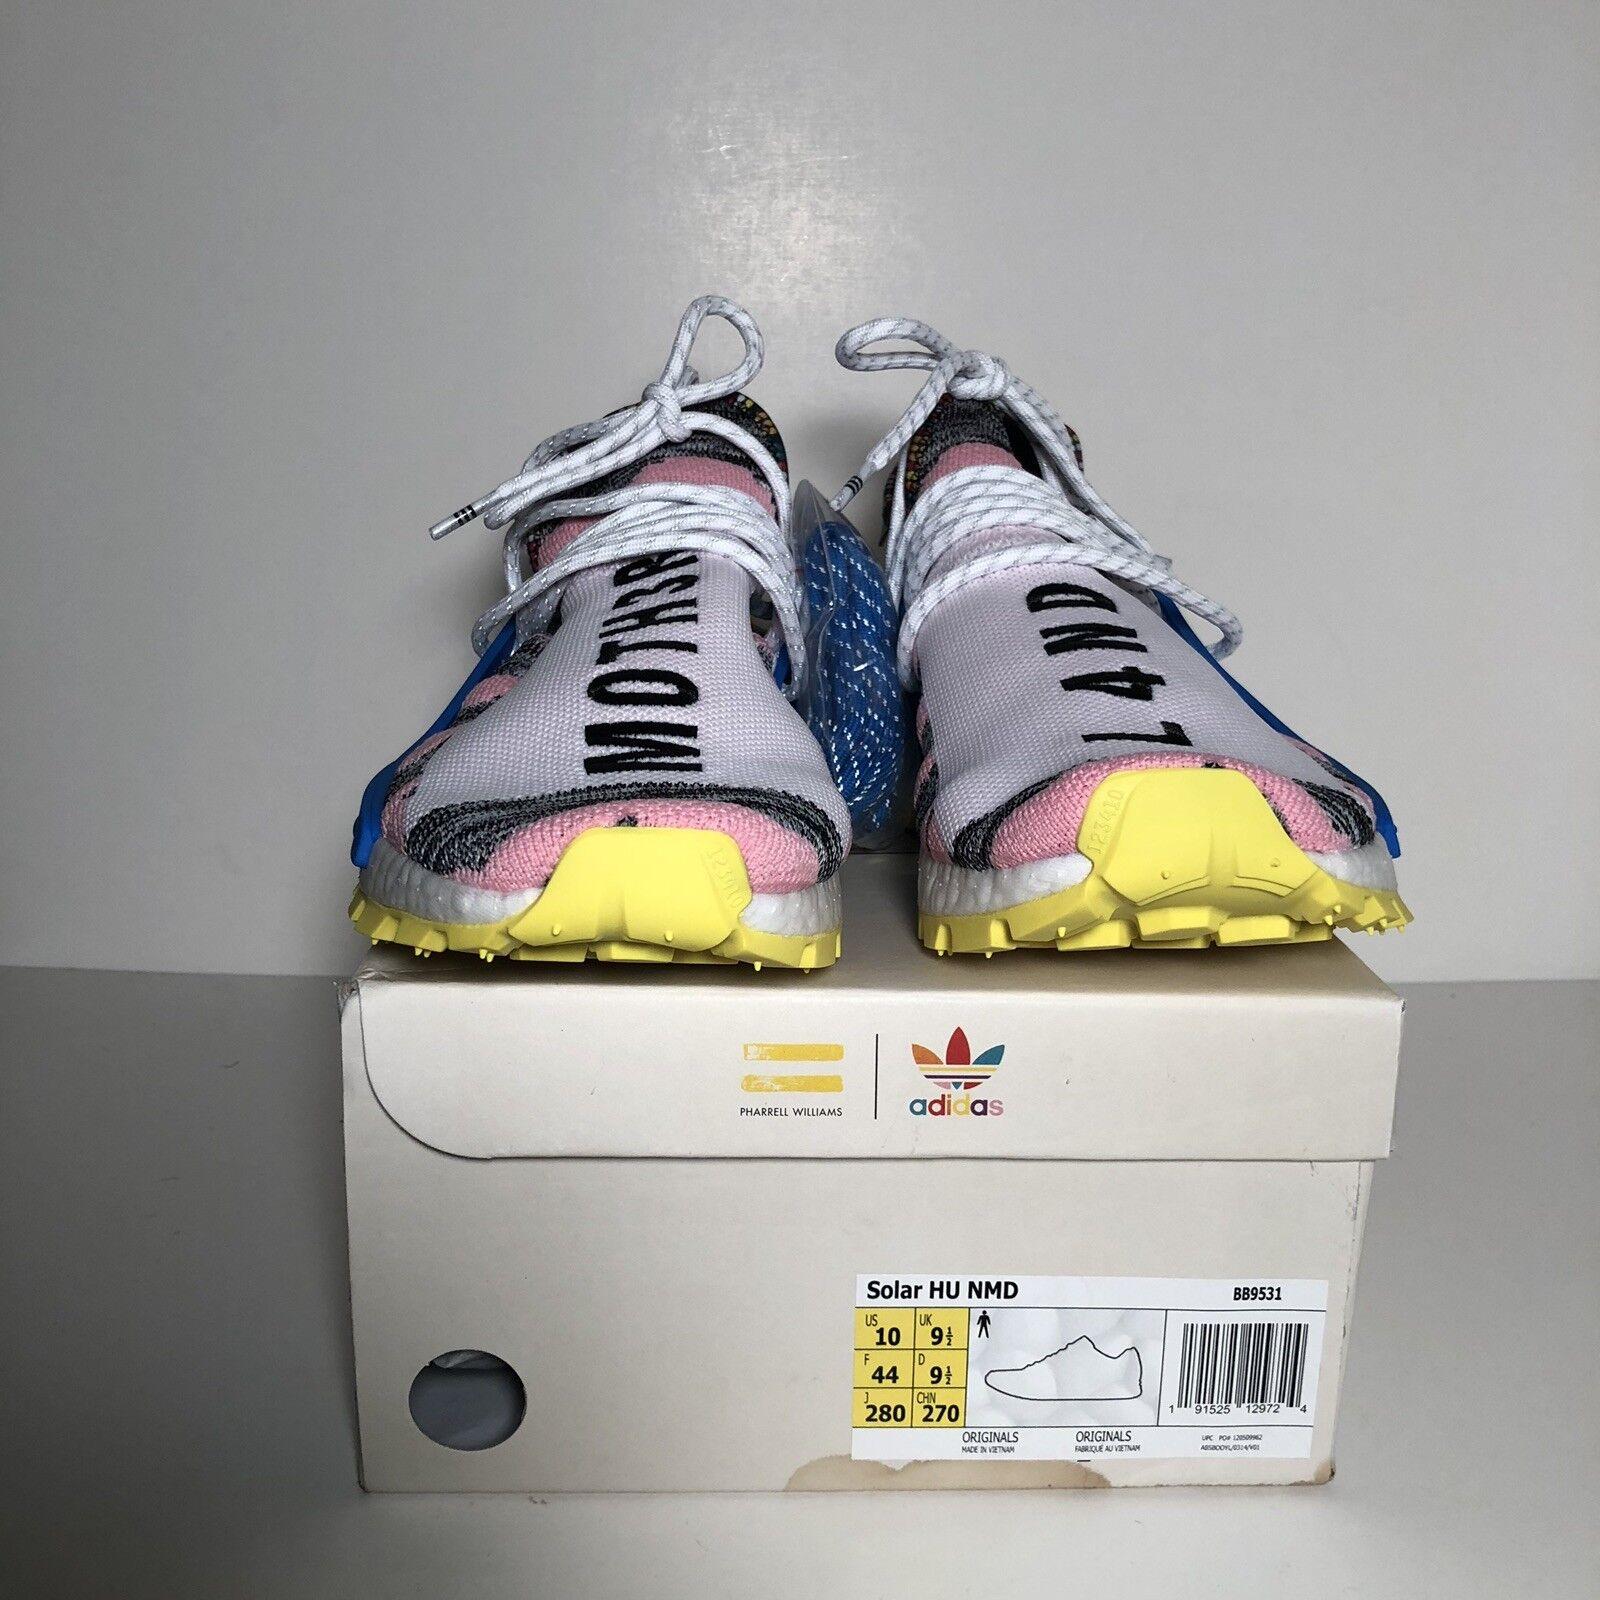 Adidas x pharrell hu nmd solar - packung rosa bb9531 blaumänner sz uns bb9531 rosa bnib 10,0 21a1d8